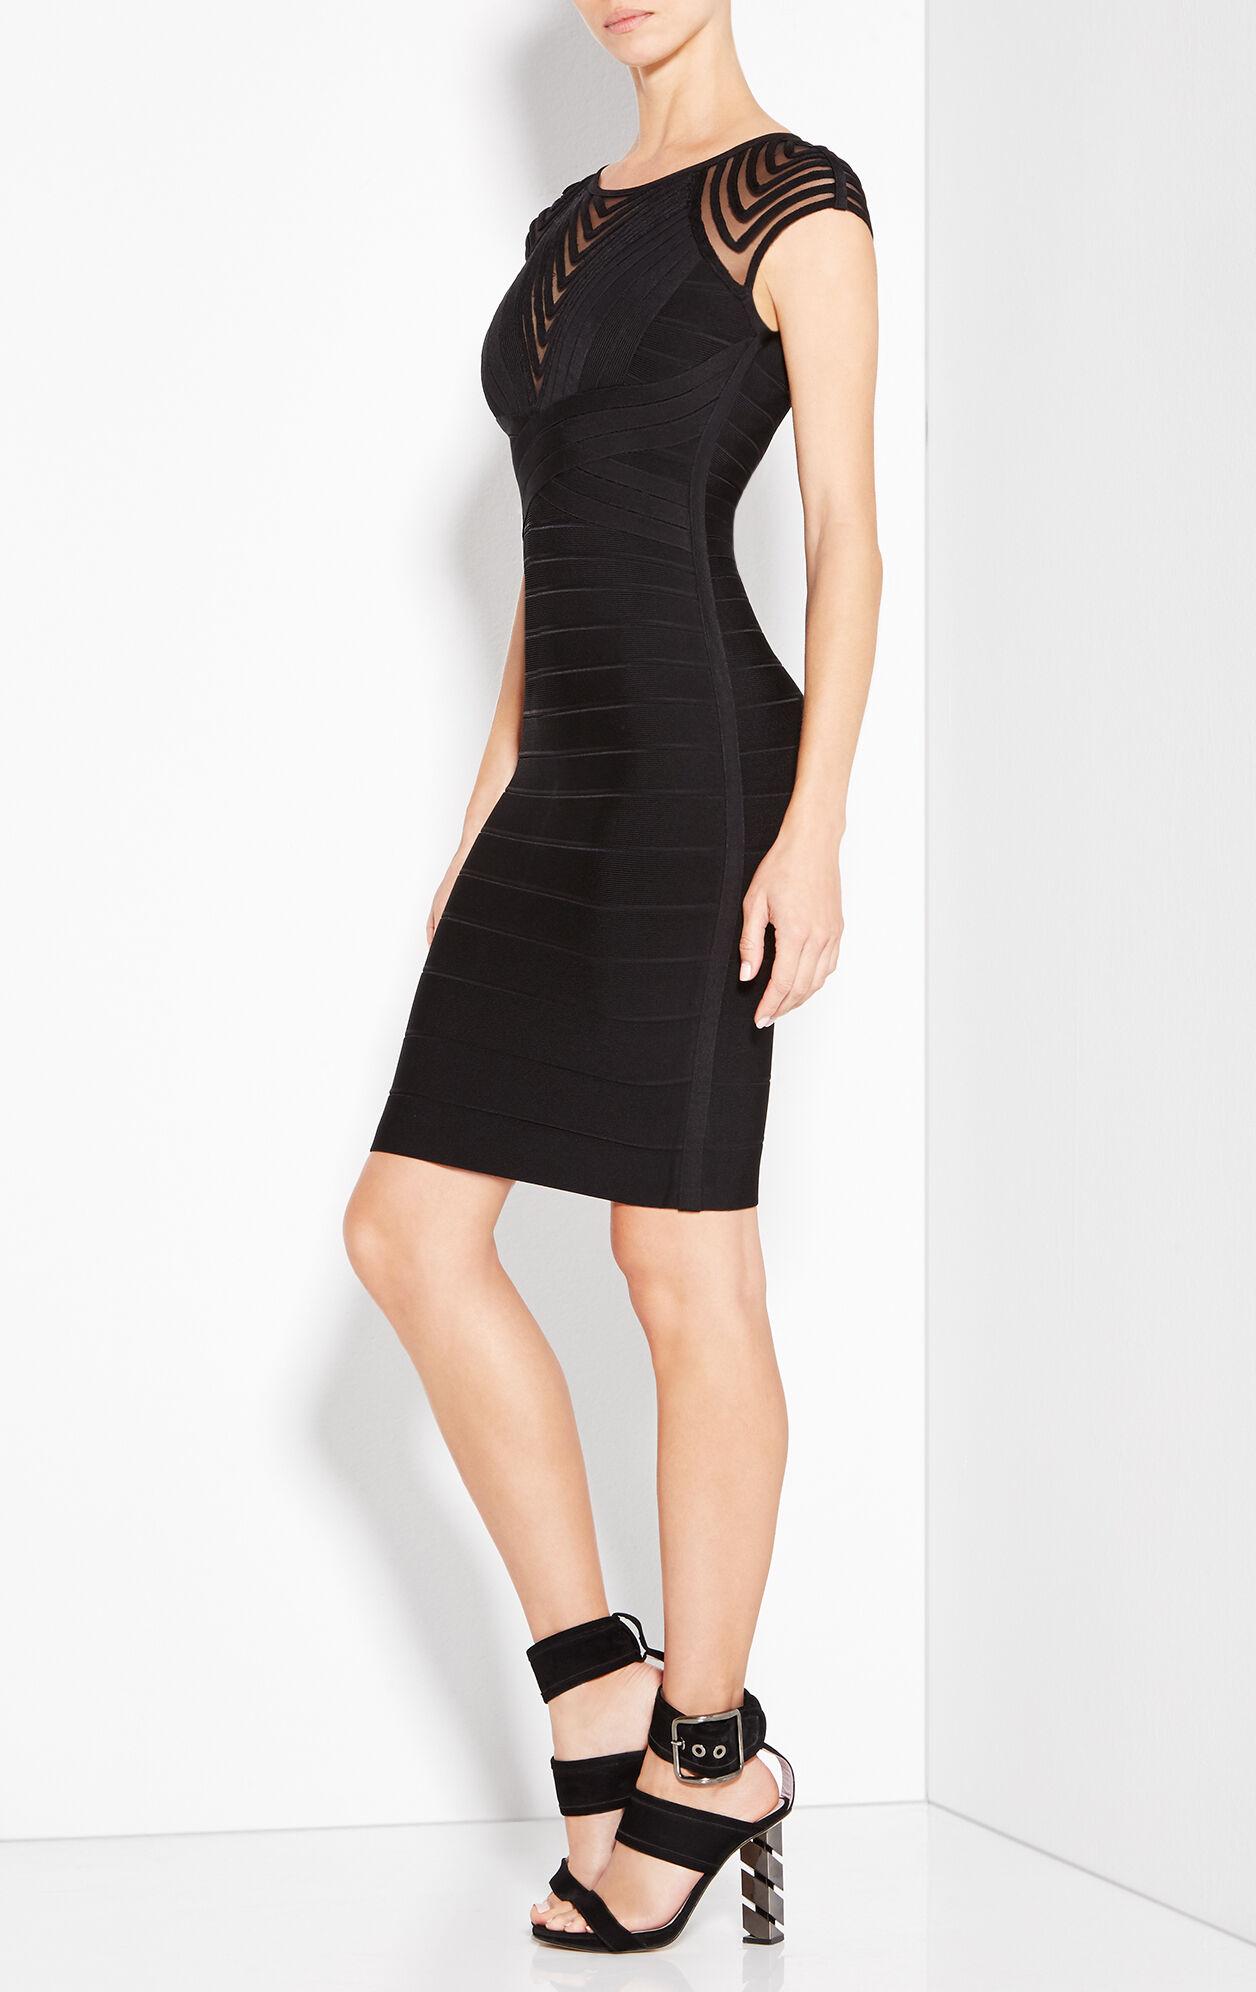 Deanna Tulle Applique Dress